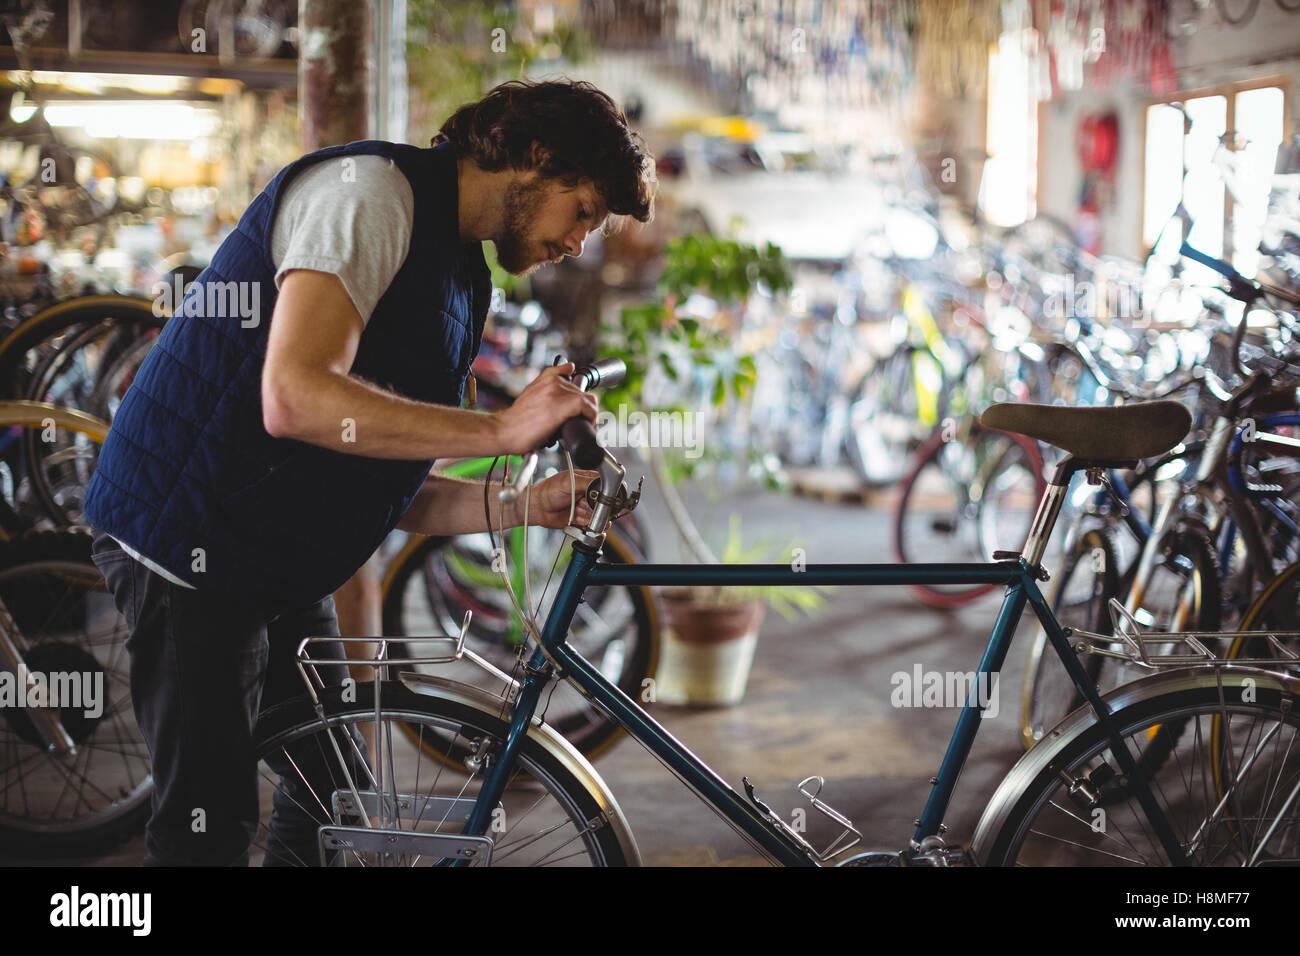 Mechanic examining bicycle Stock Photo